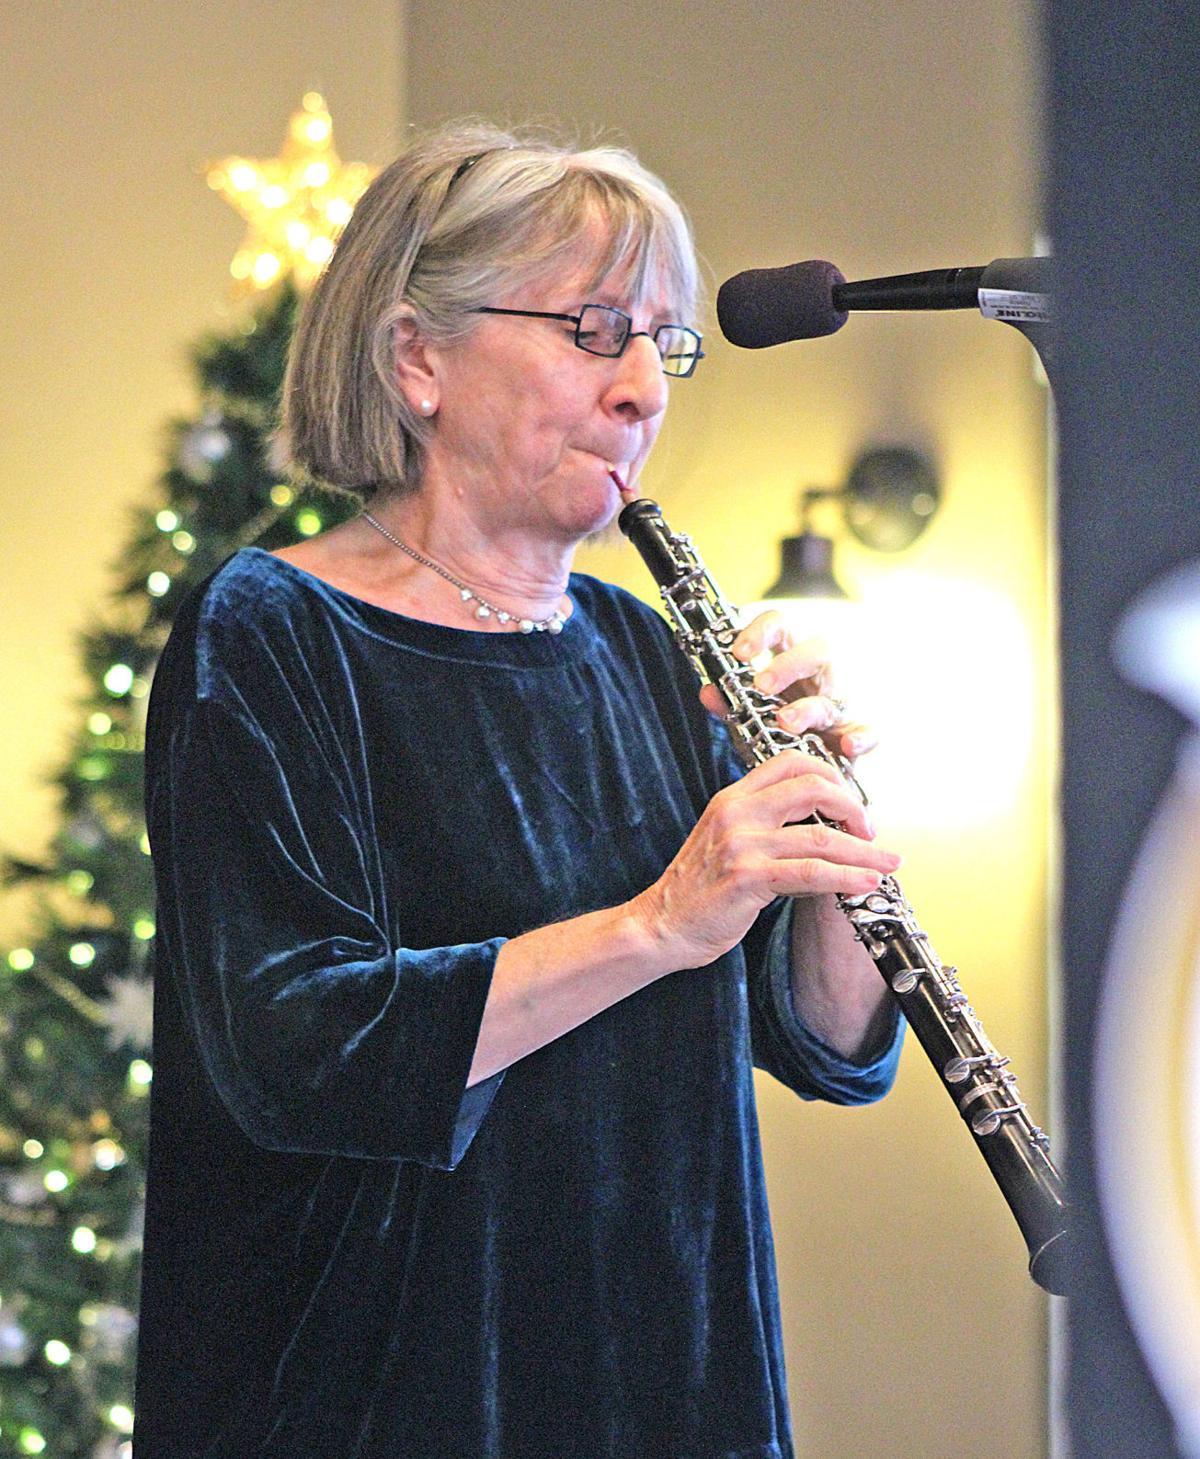 Beautiful music in a festive setting